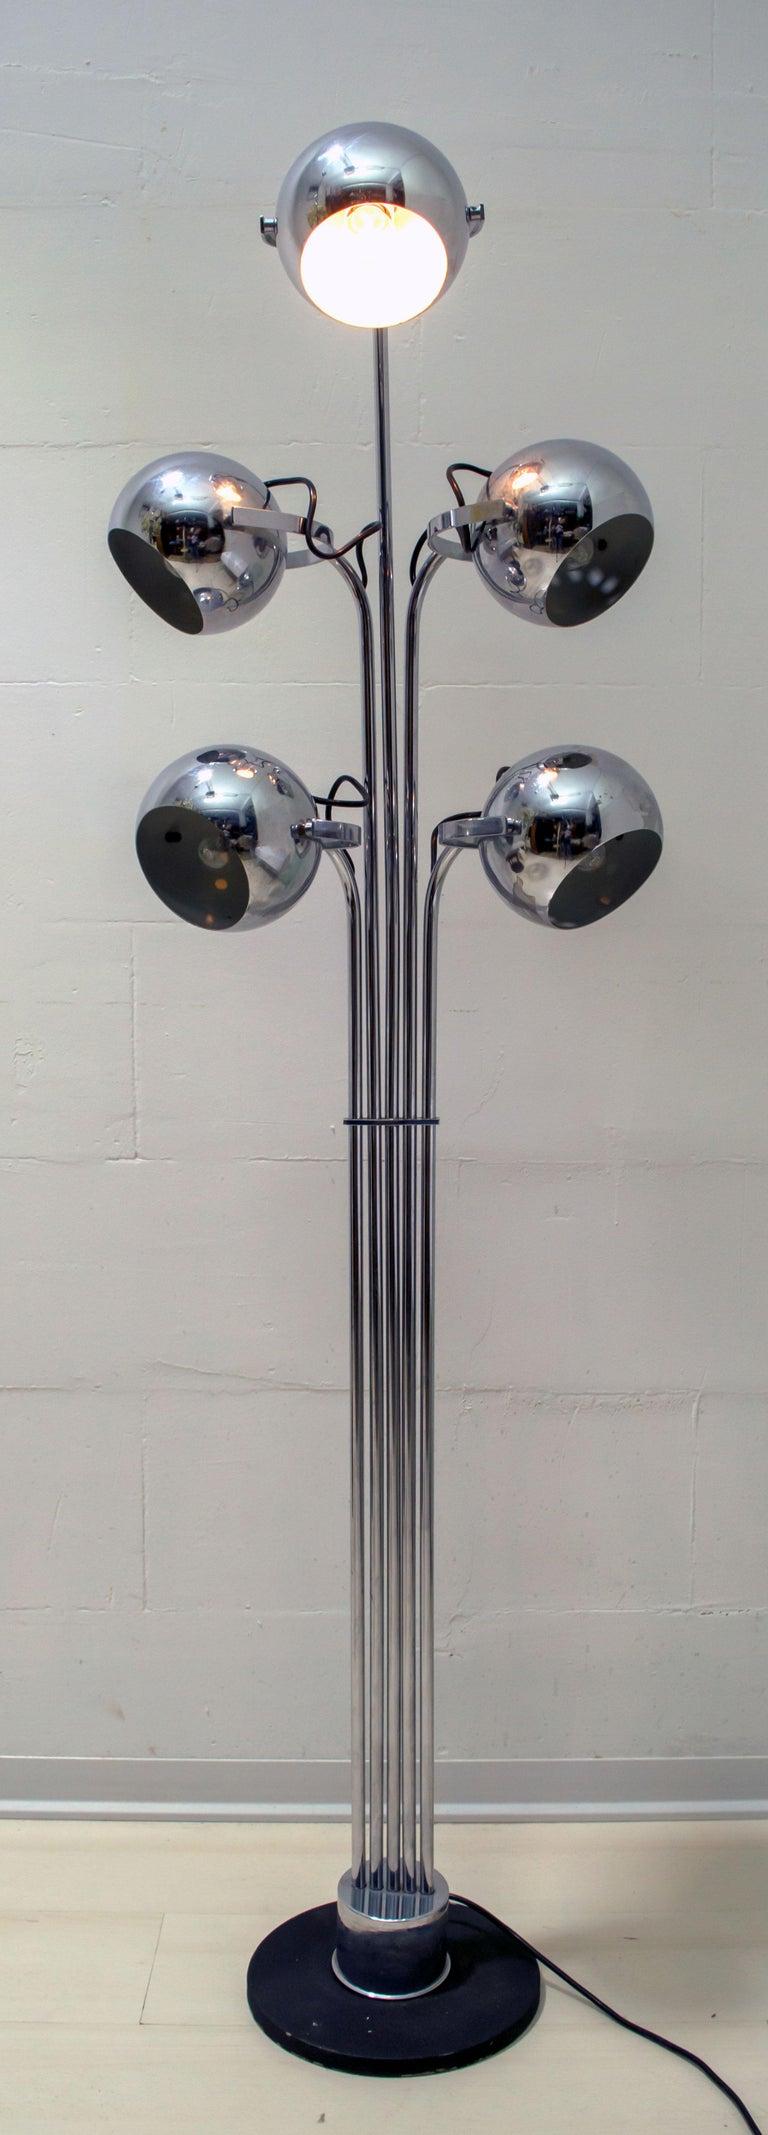 Goffredo Reggiani Mid-Century Modern Italian 5 Lights Chrome Floor Lamp, 1970s For Sale 1